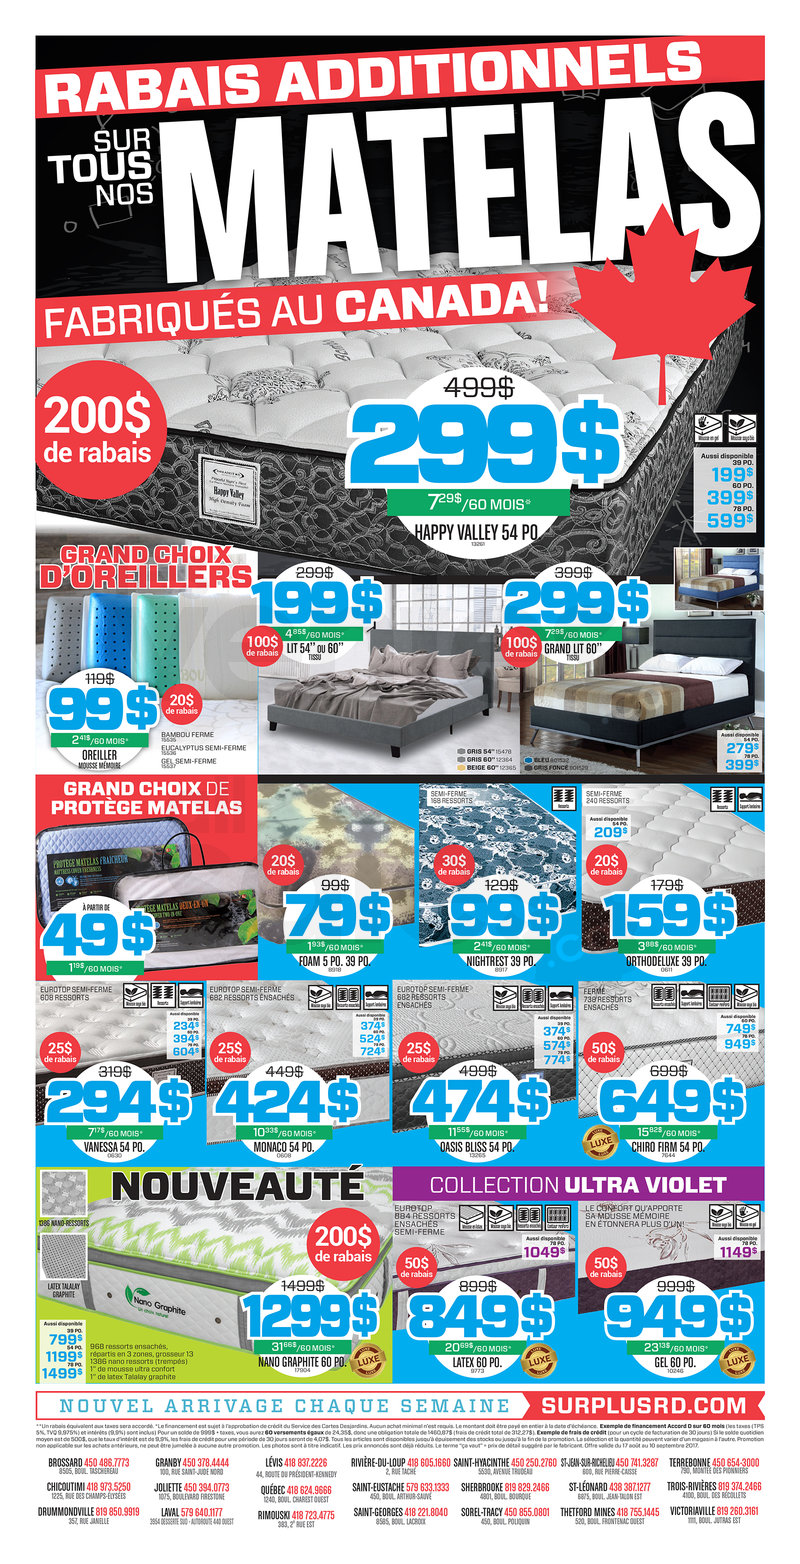 Liquidation meubles et lectrom nagers for Liquidation meuble rive sud